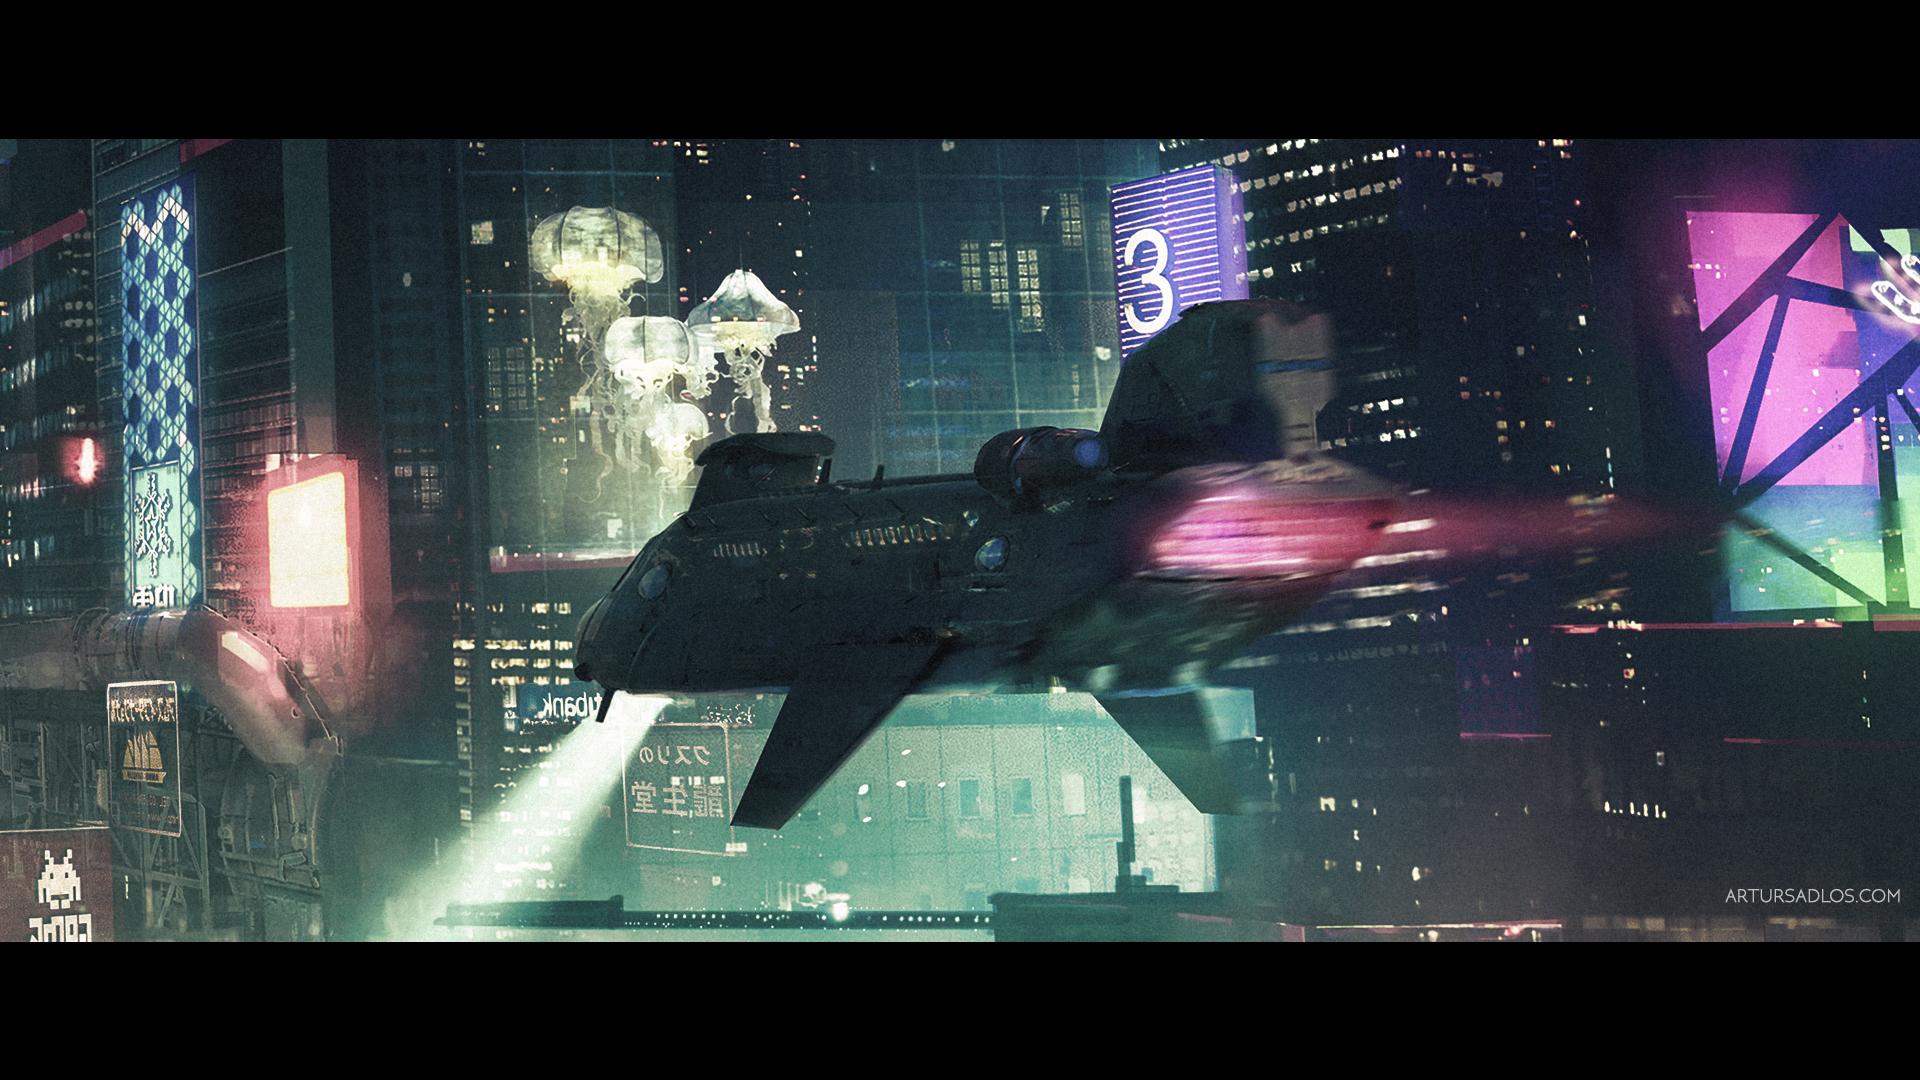 future_tokyo_003_wip004_frame001.jpg